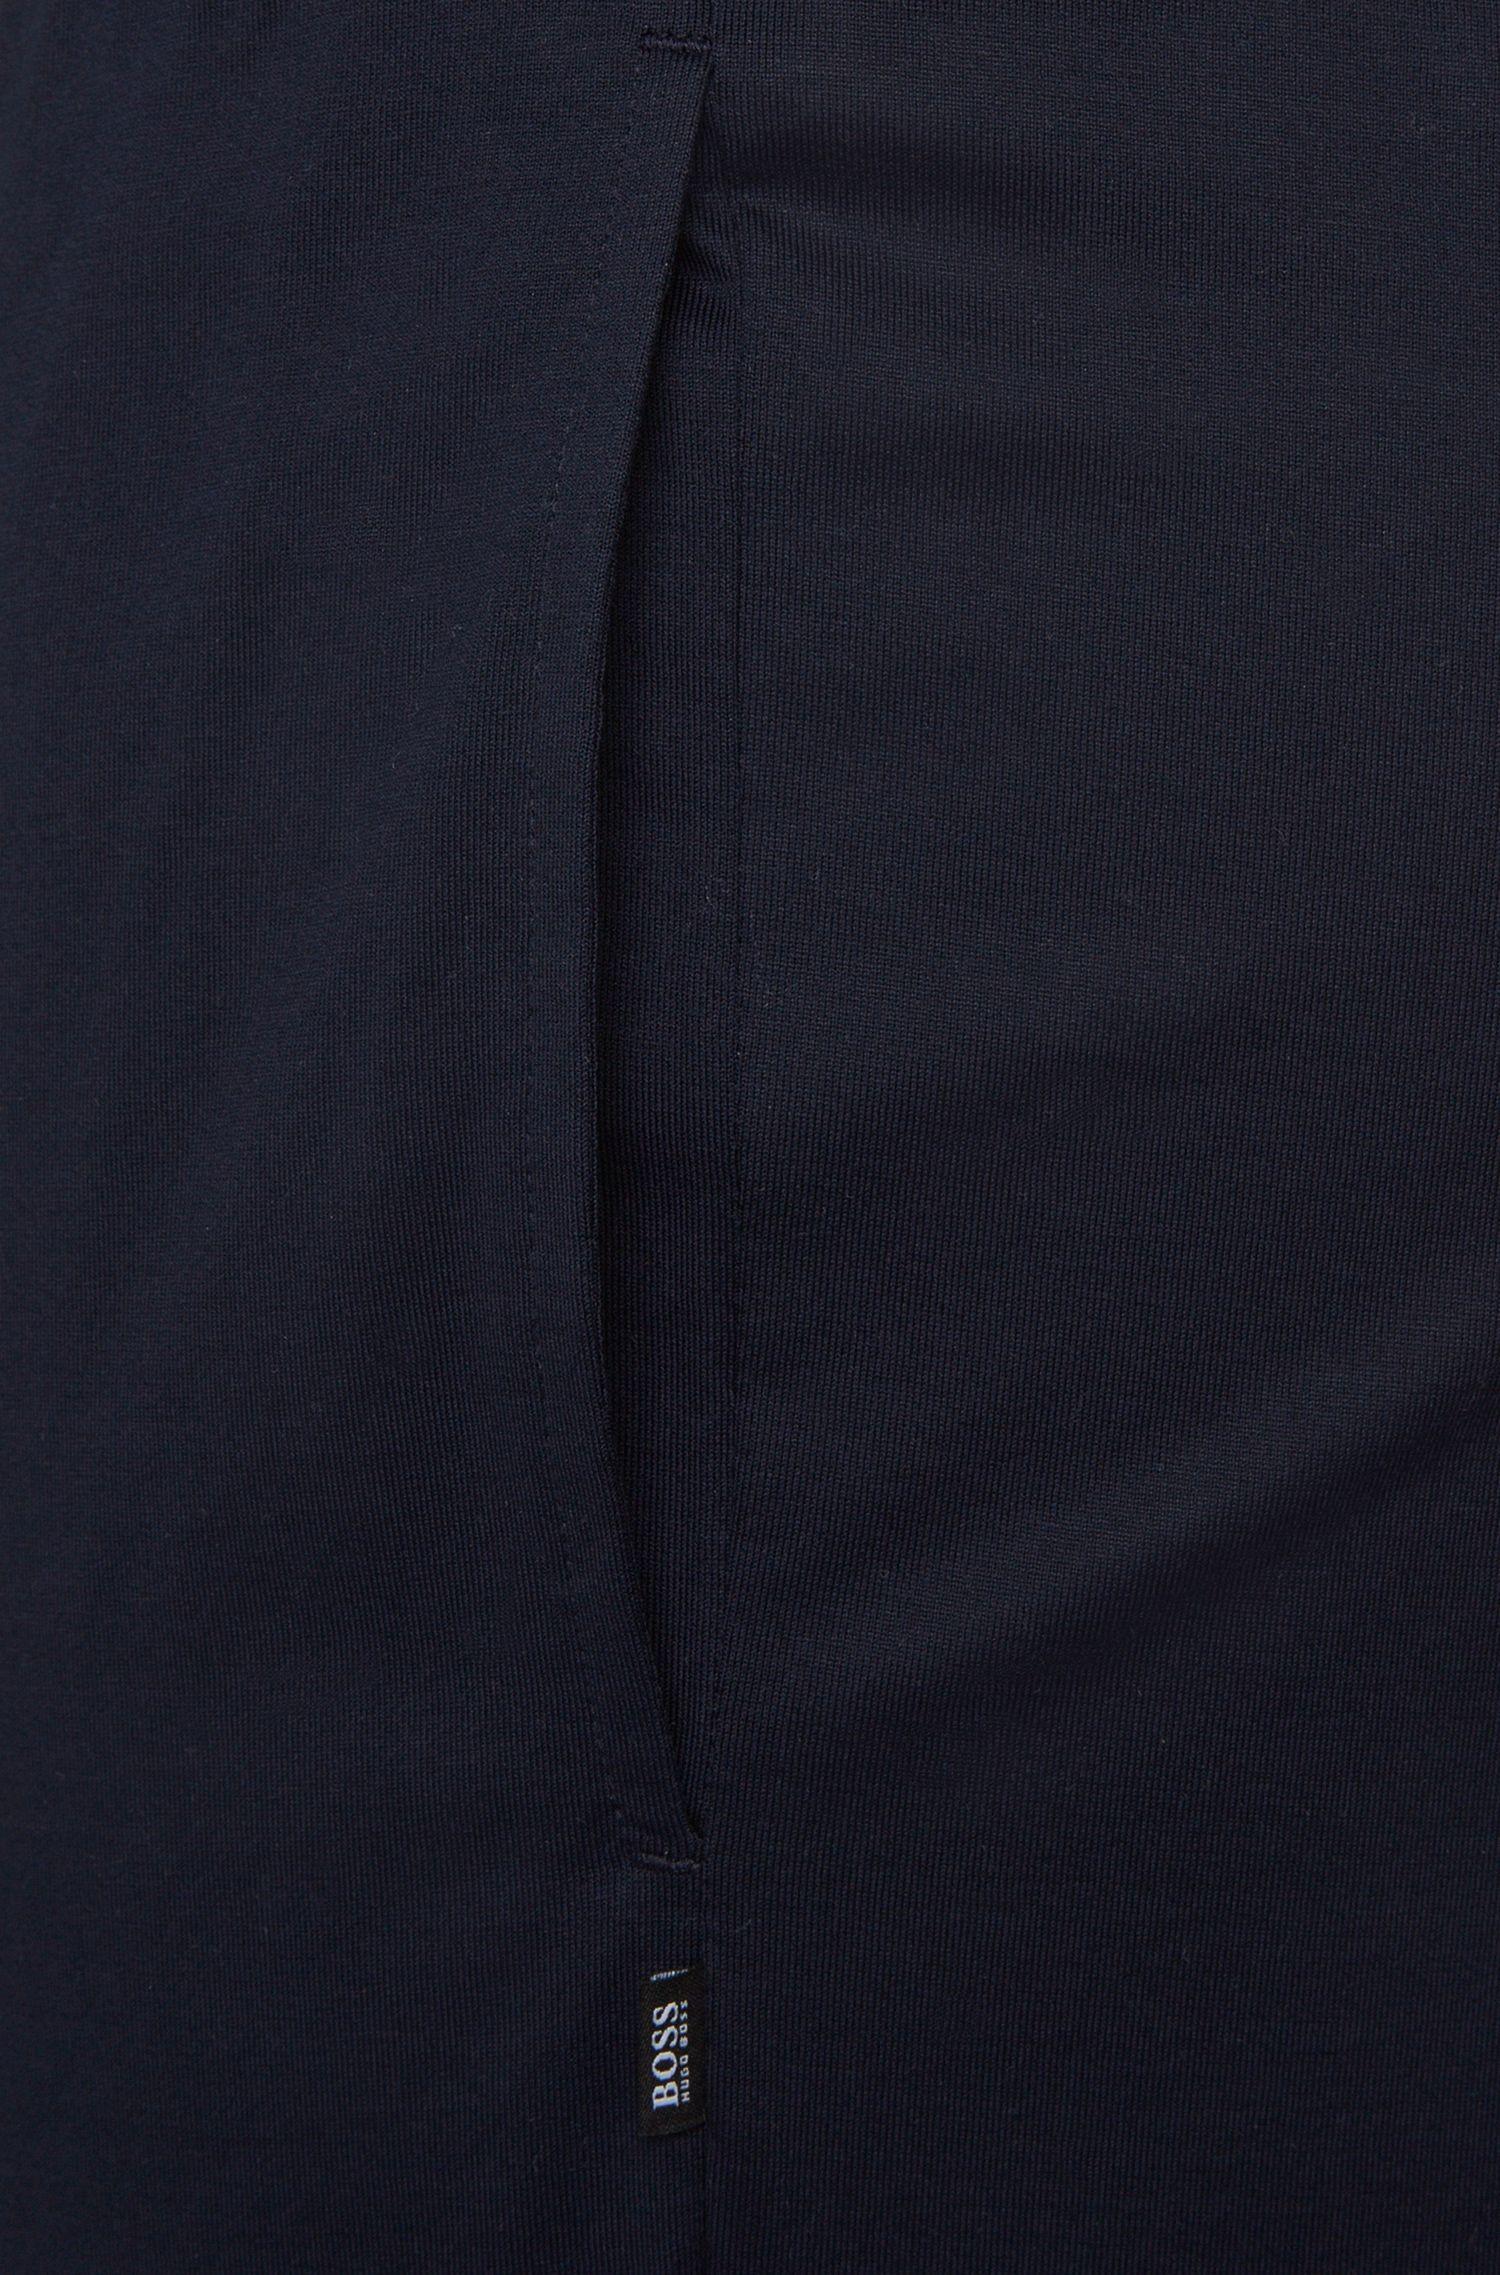 Pyjama-Hose aus reiner Baumwolle: 'Long Pant CW'